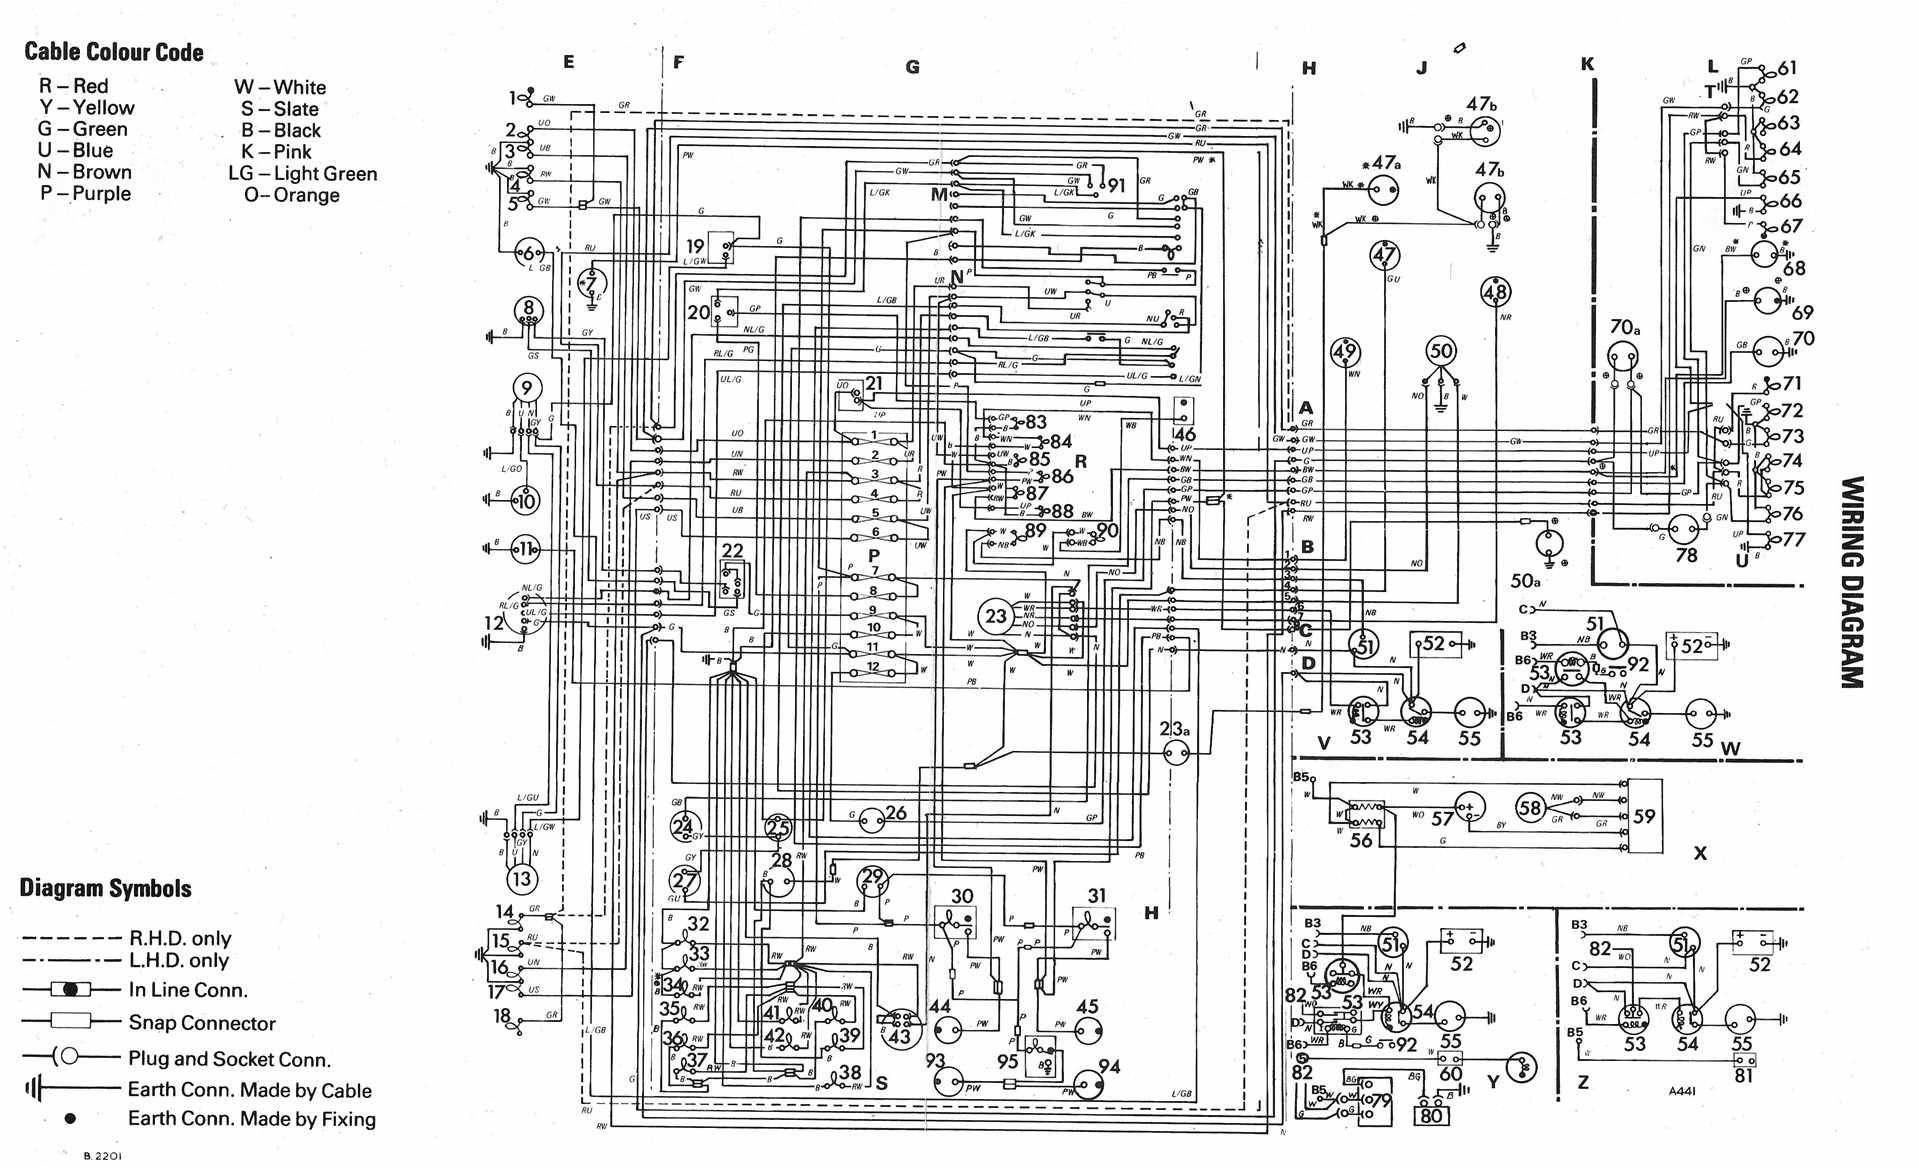 Electrical Wiring Diagram Of Volkswagen Golf Mk1 Vw Up Volkswagen Golf Mk1 Vw Golf